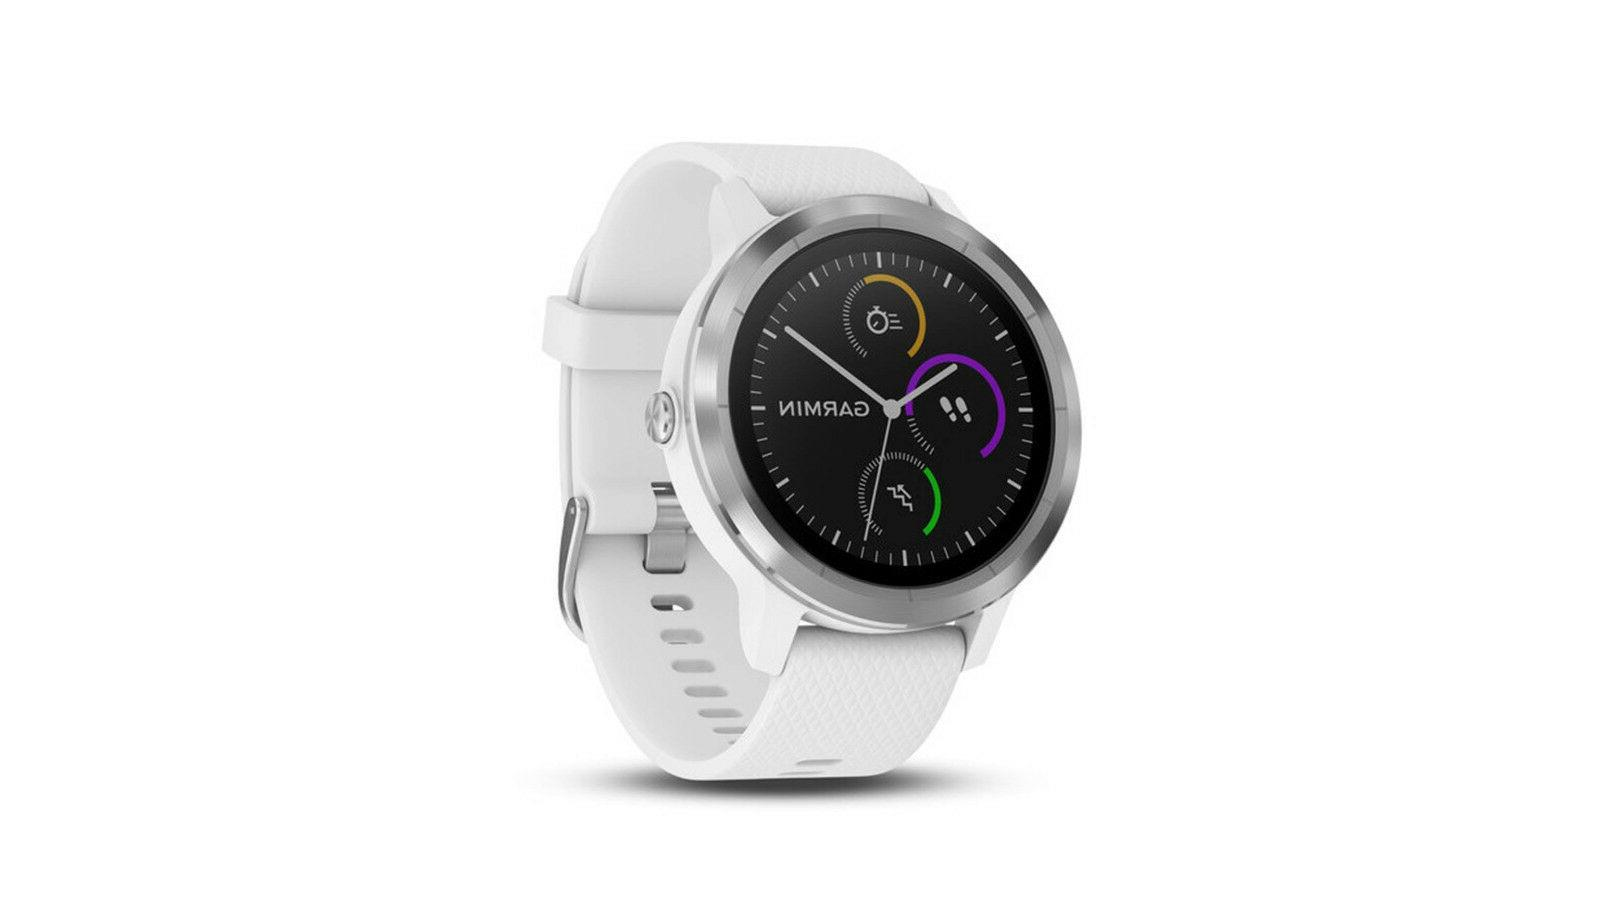 Garmin Watch,  